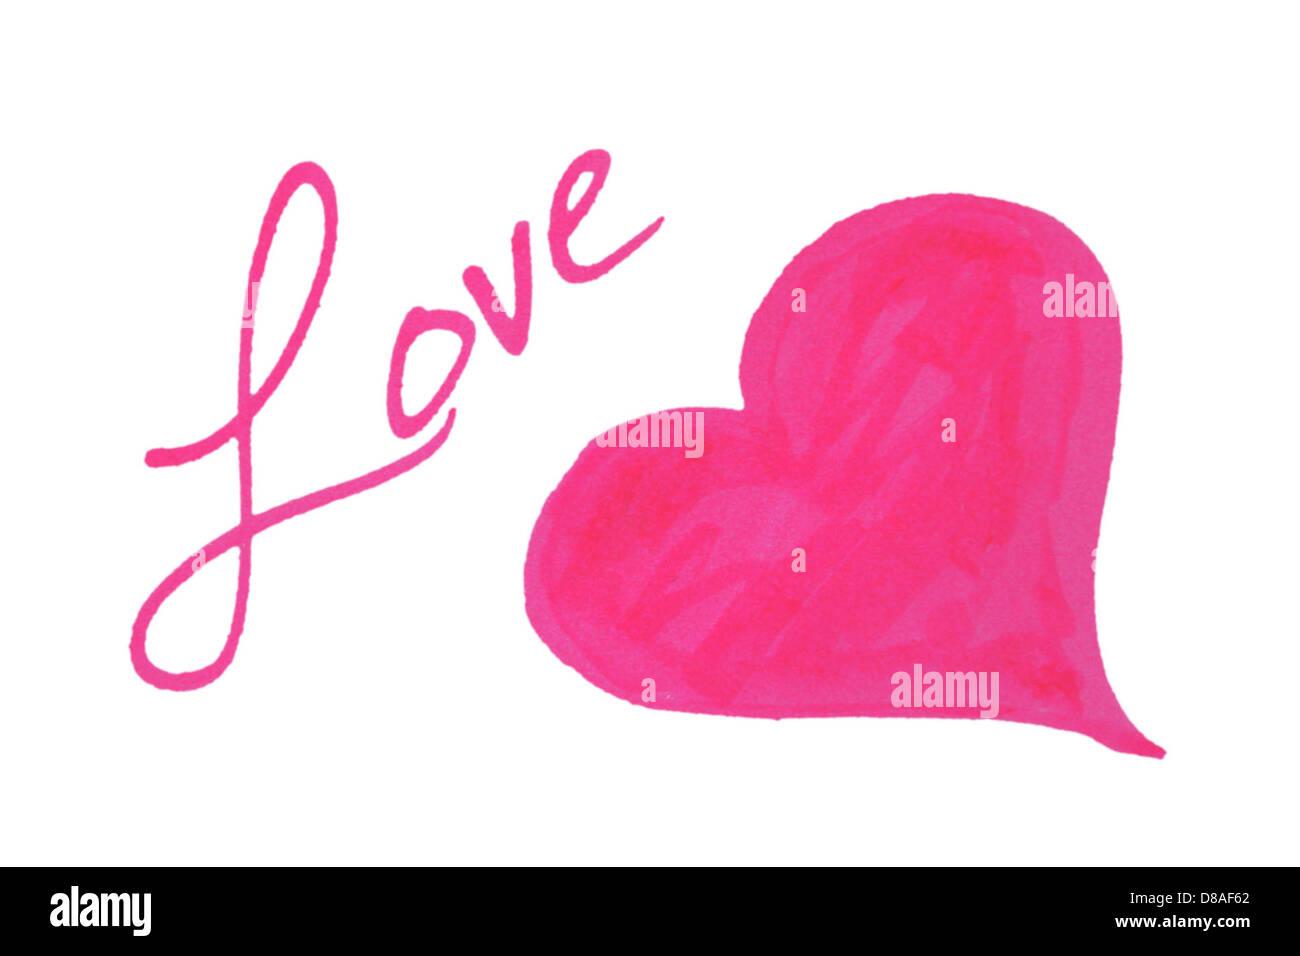 love heart clip art. - Stock Image